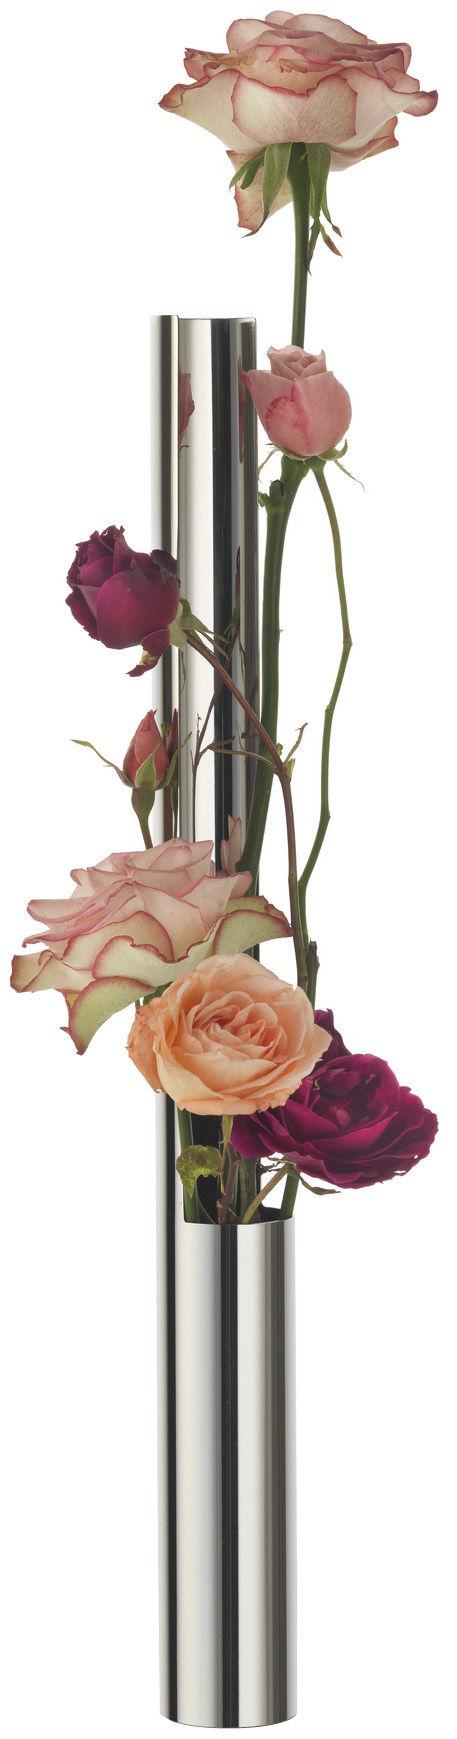 Flower Vase Tube Vase Mirror polished steel by Alessi